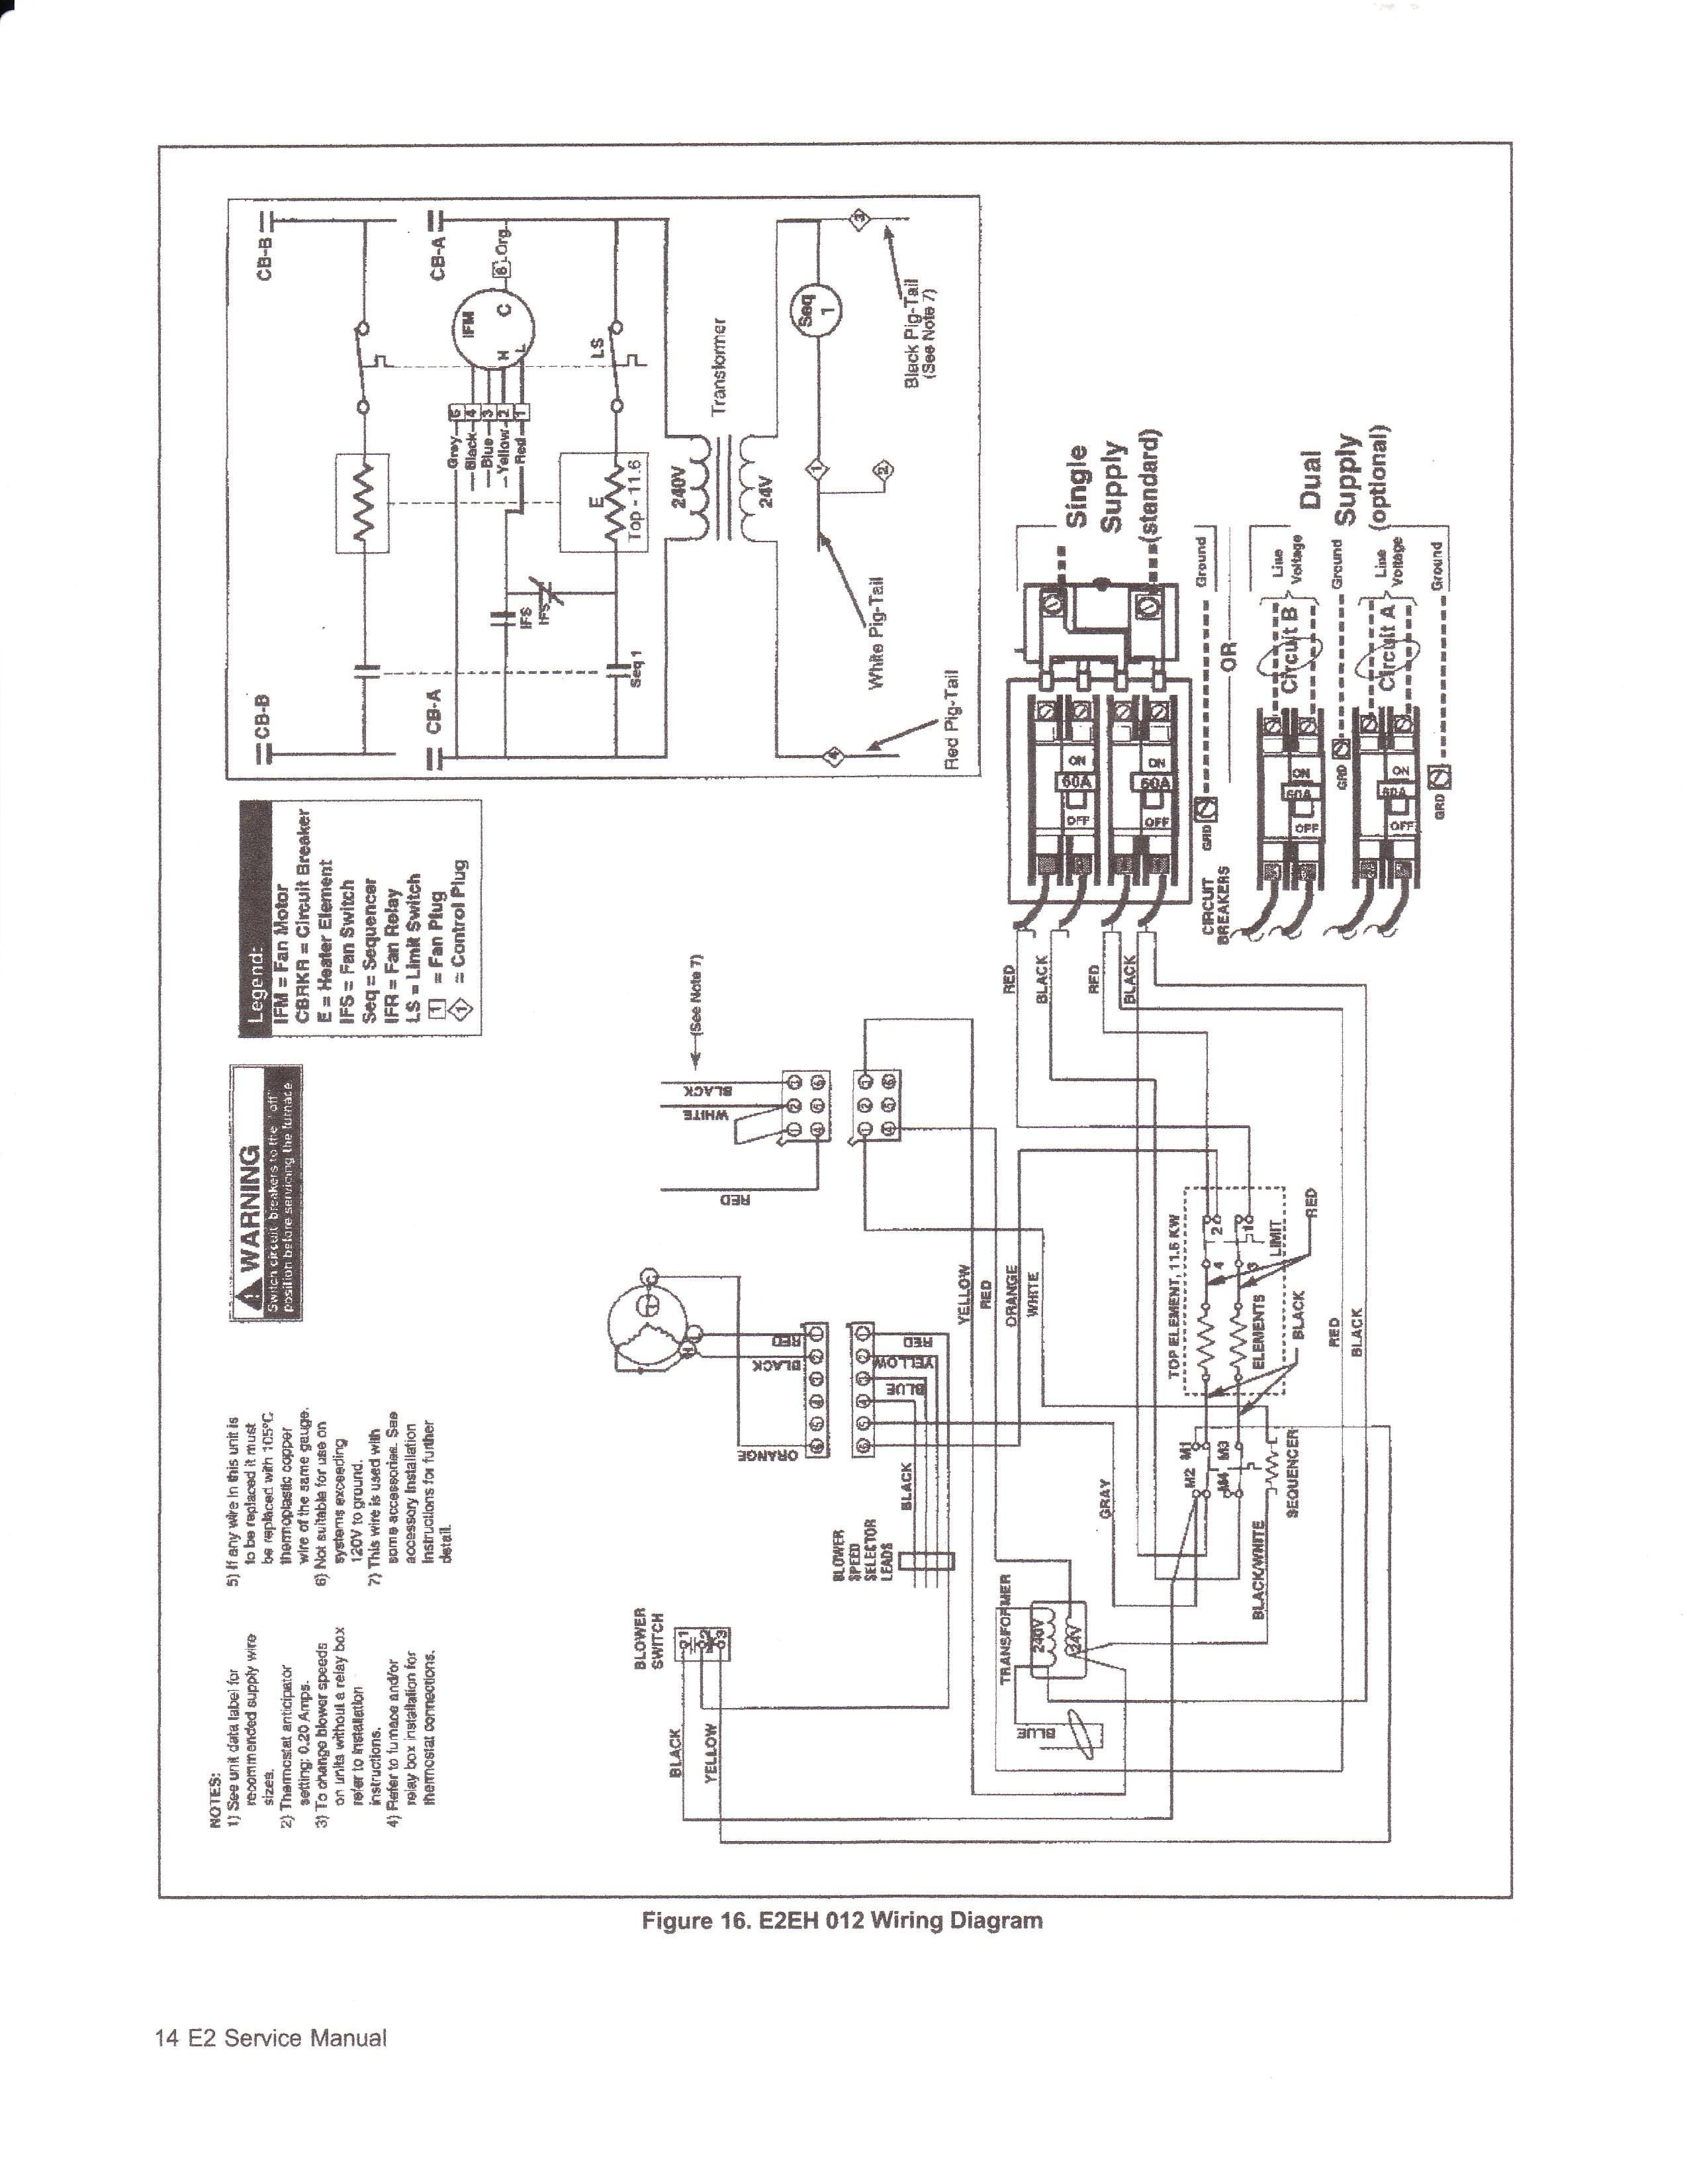 mobile home wiring diagram kgt rh kgt me